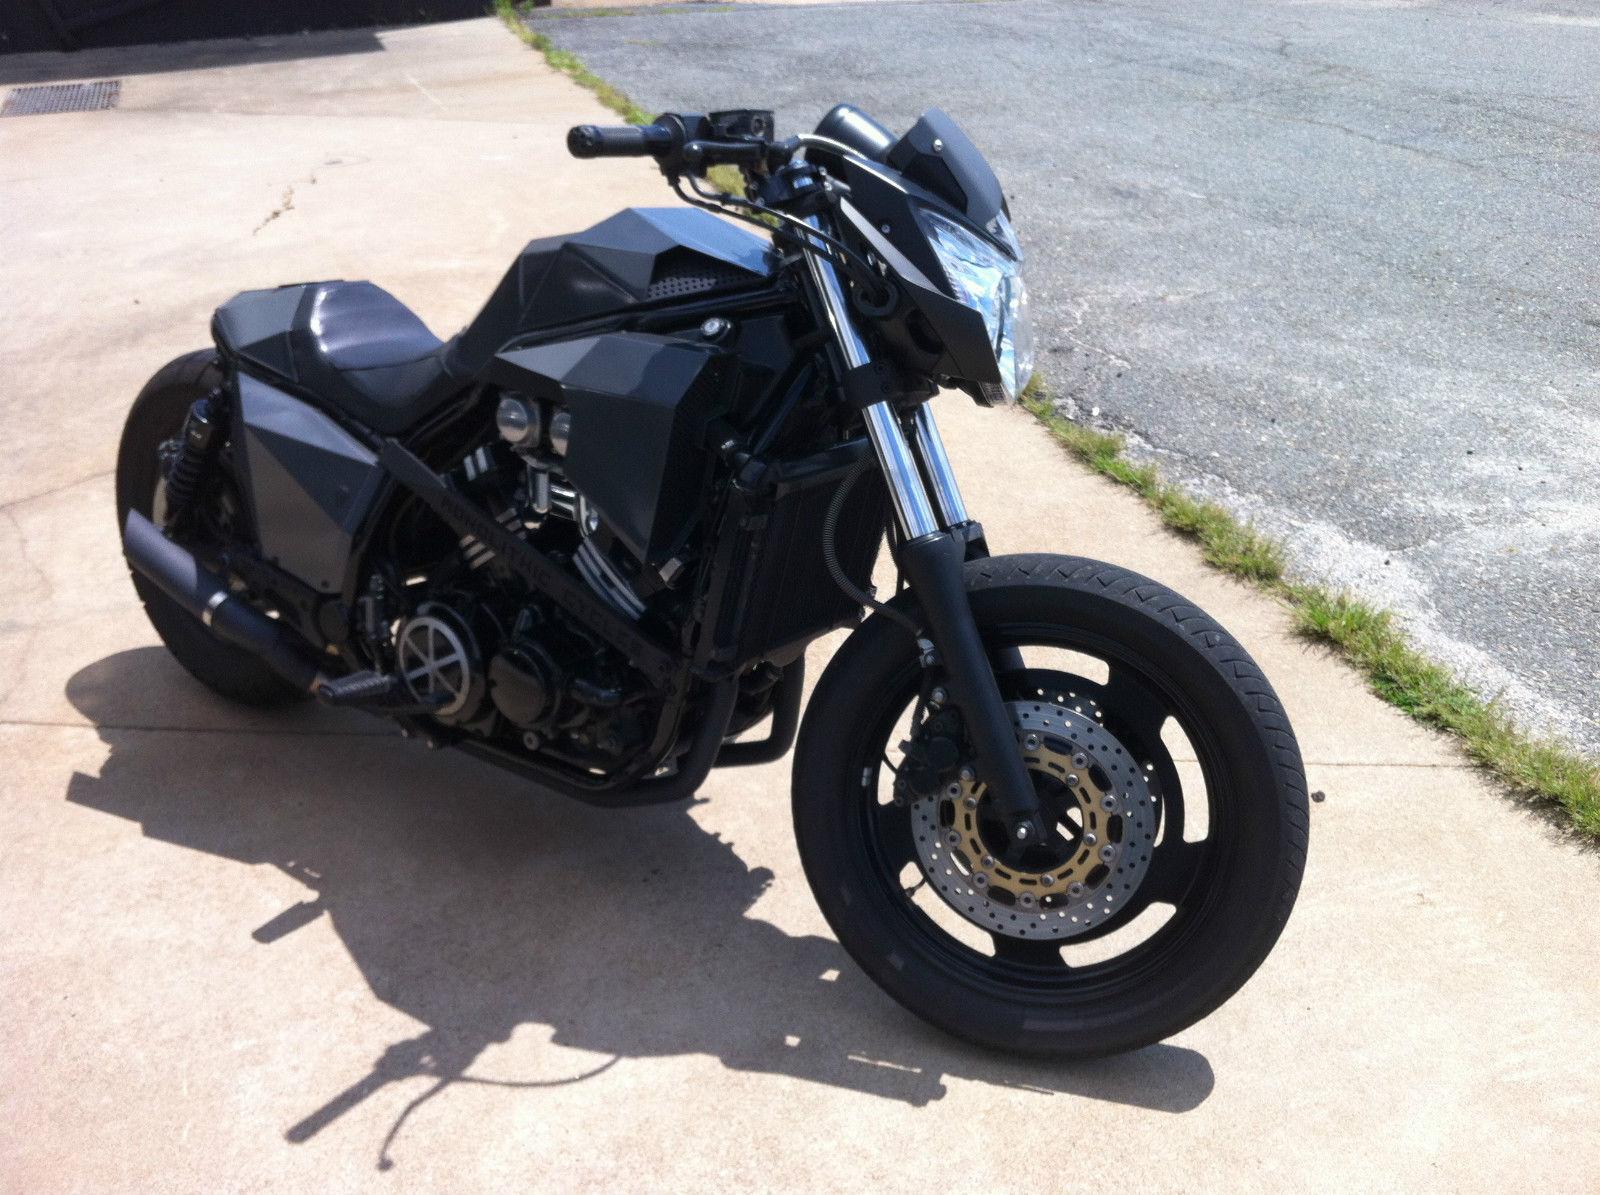 custom 1996 yamaha vmax 1200 motorcycle. Black Bedroom Furniture Sets. Home Design Ideas